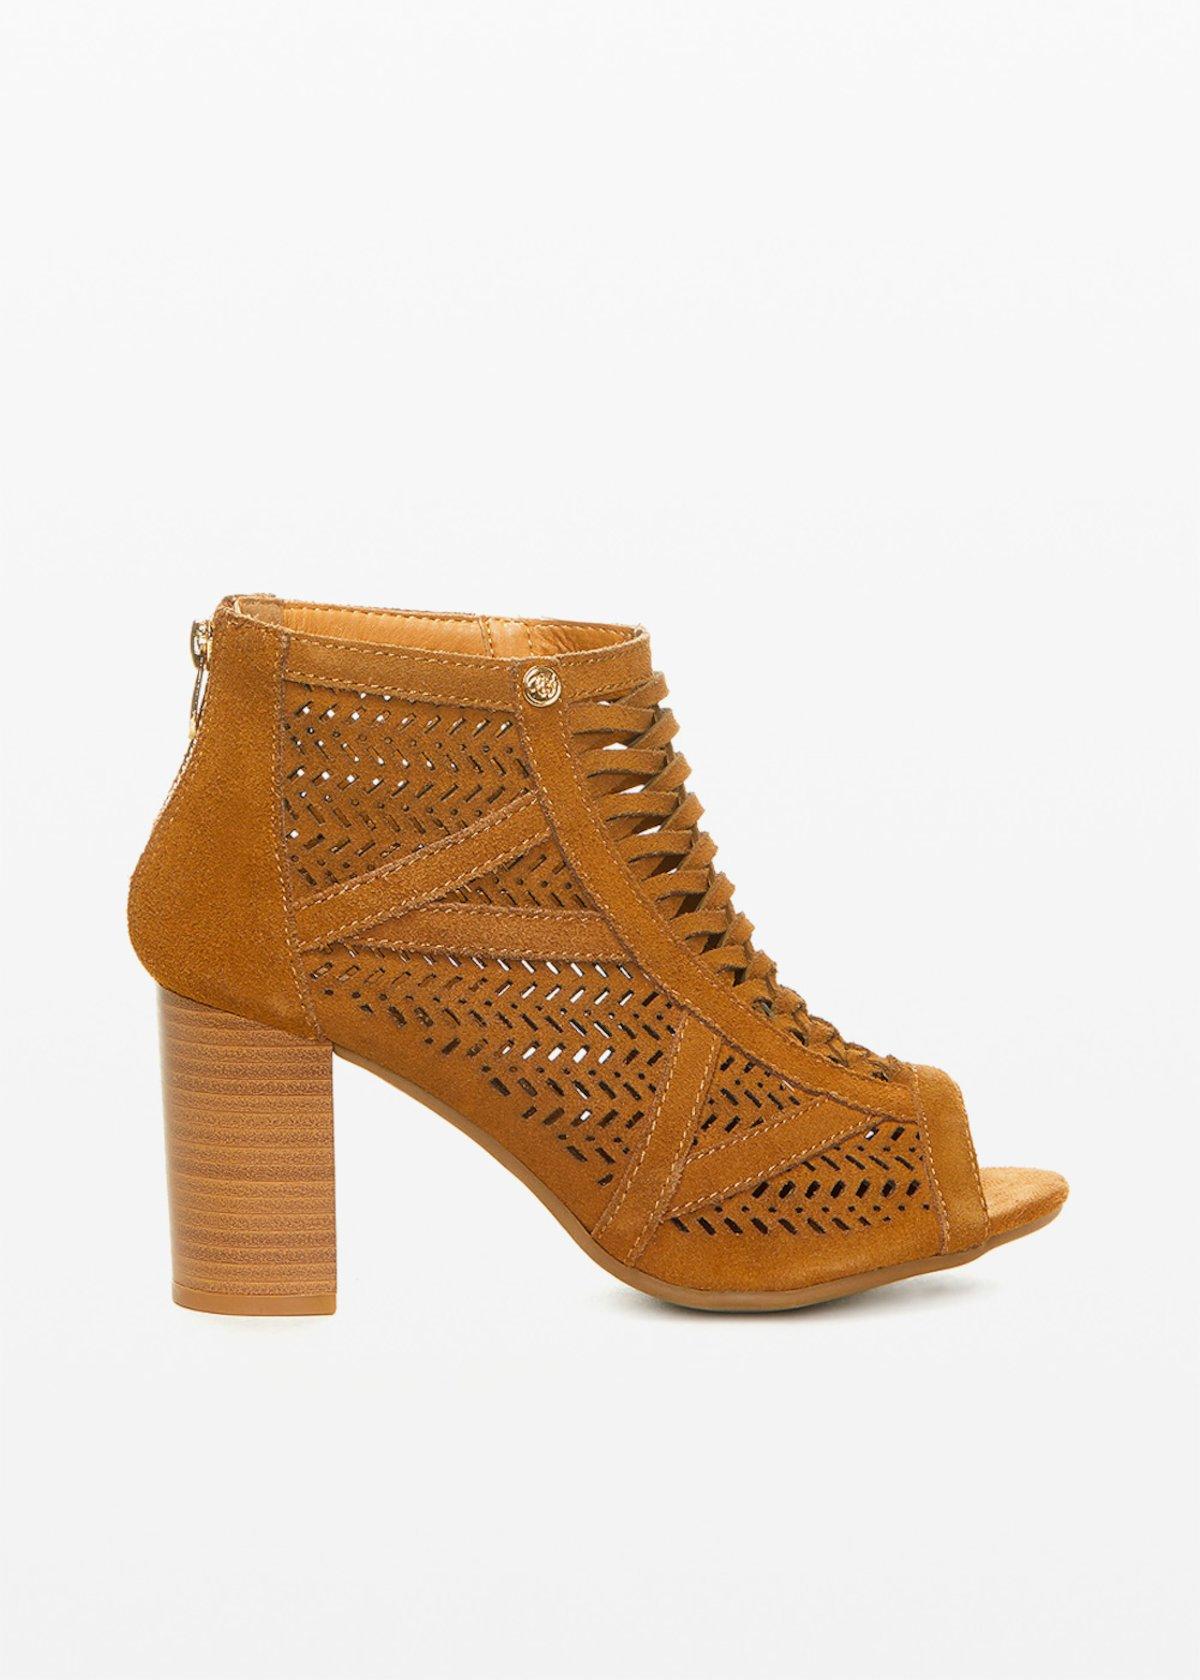 Real cow suede shoes Sharyl dal design traforato - Tobacco - Donna - Immagine categoria